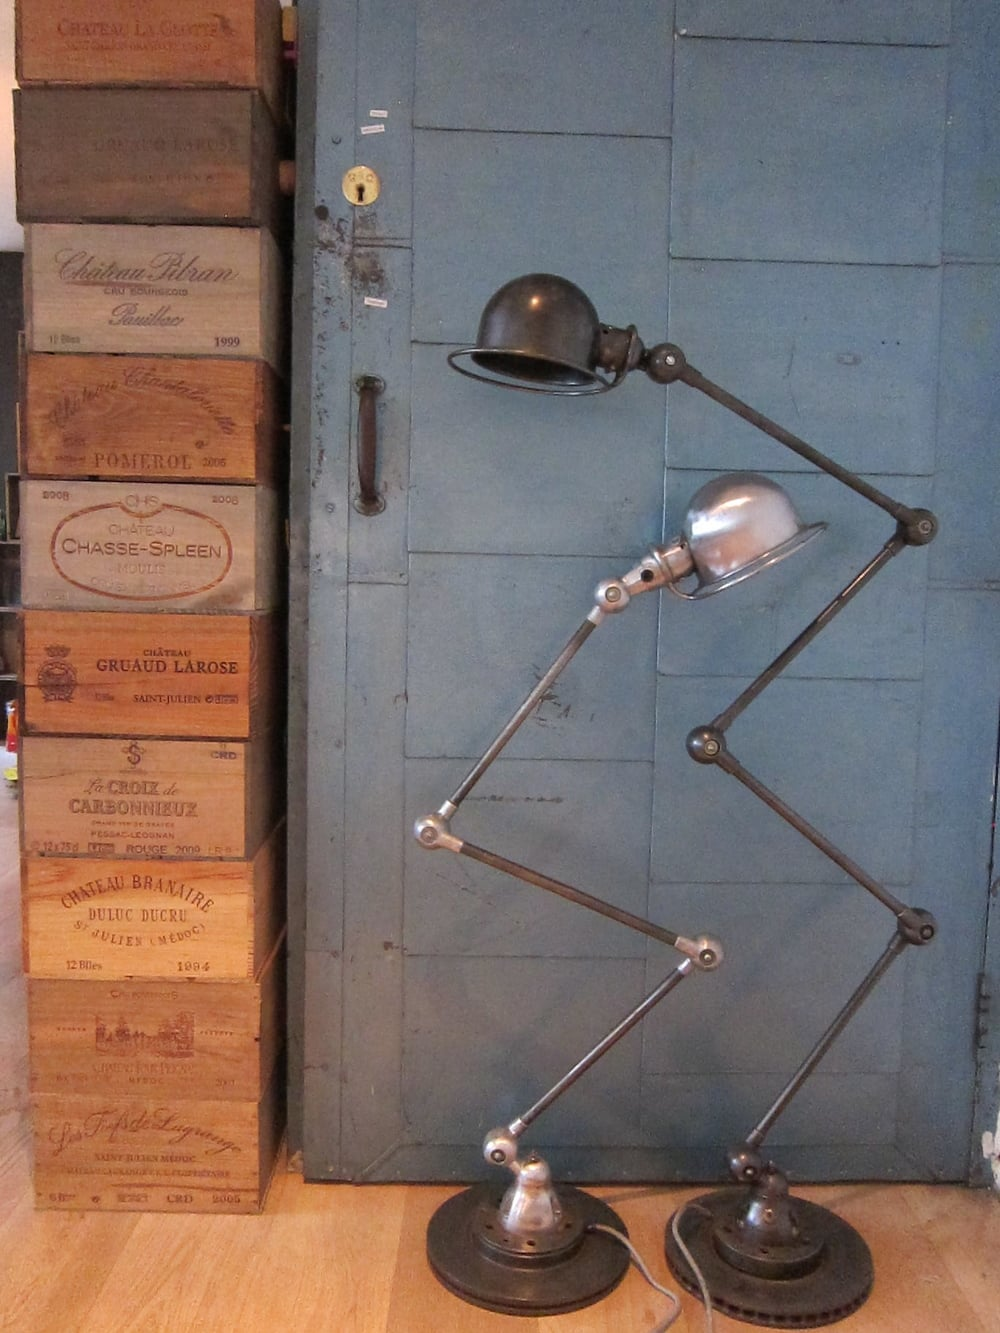 Jielde lamper — Fransk Bazar — Fransk Bazar